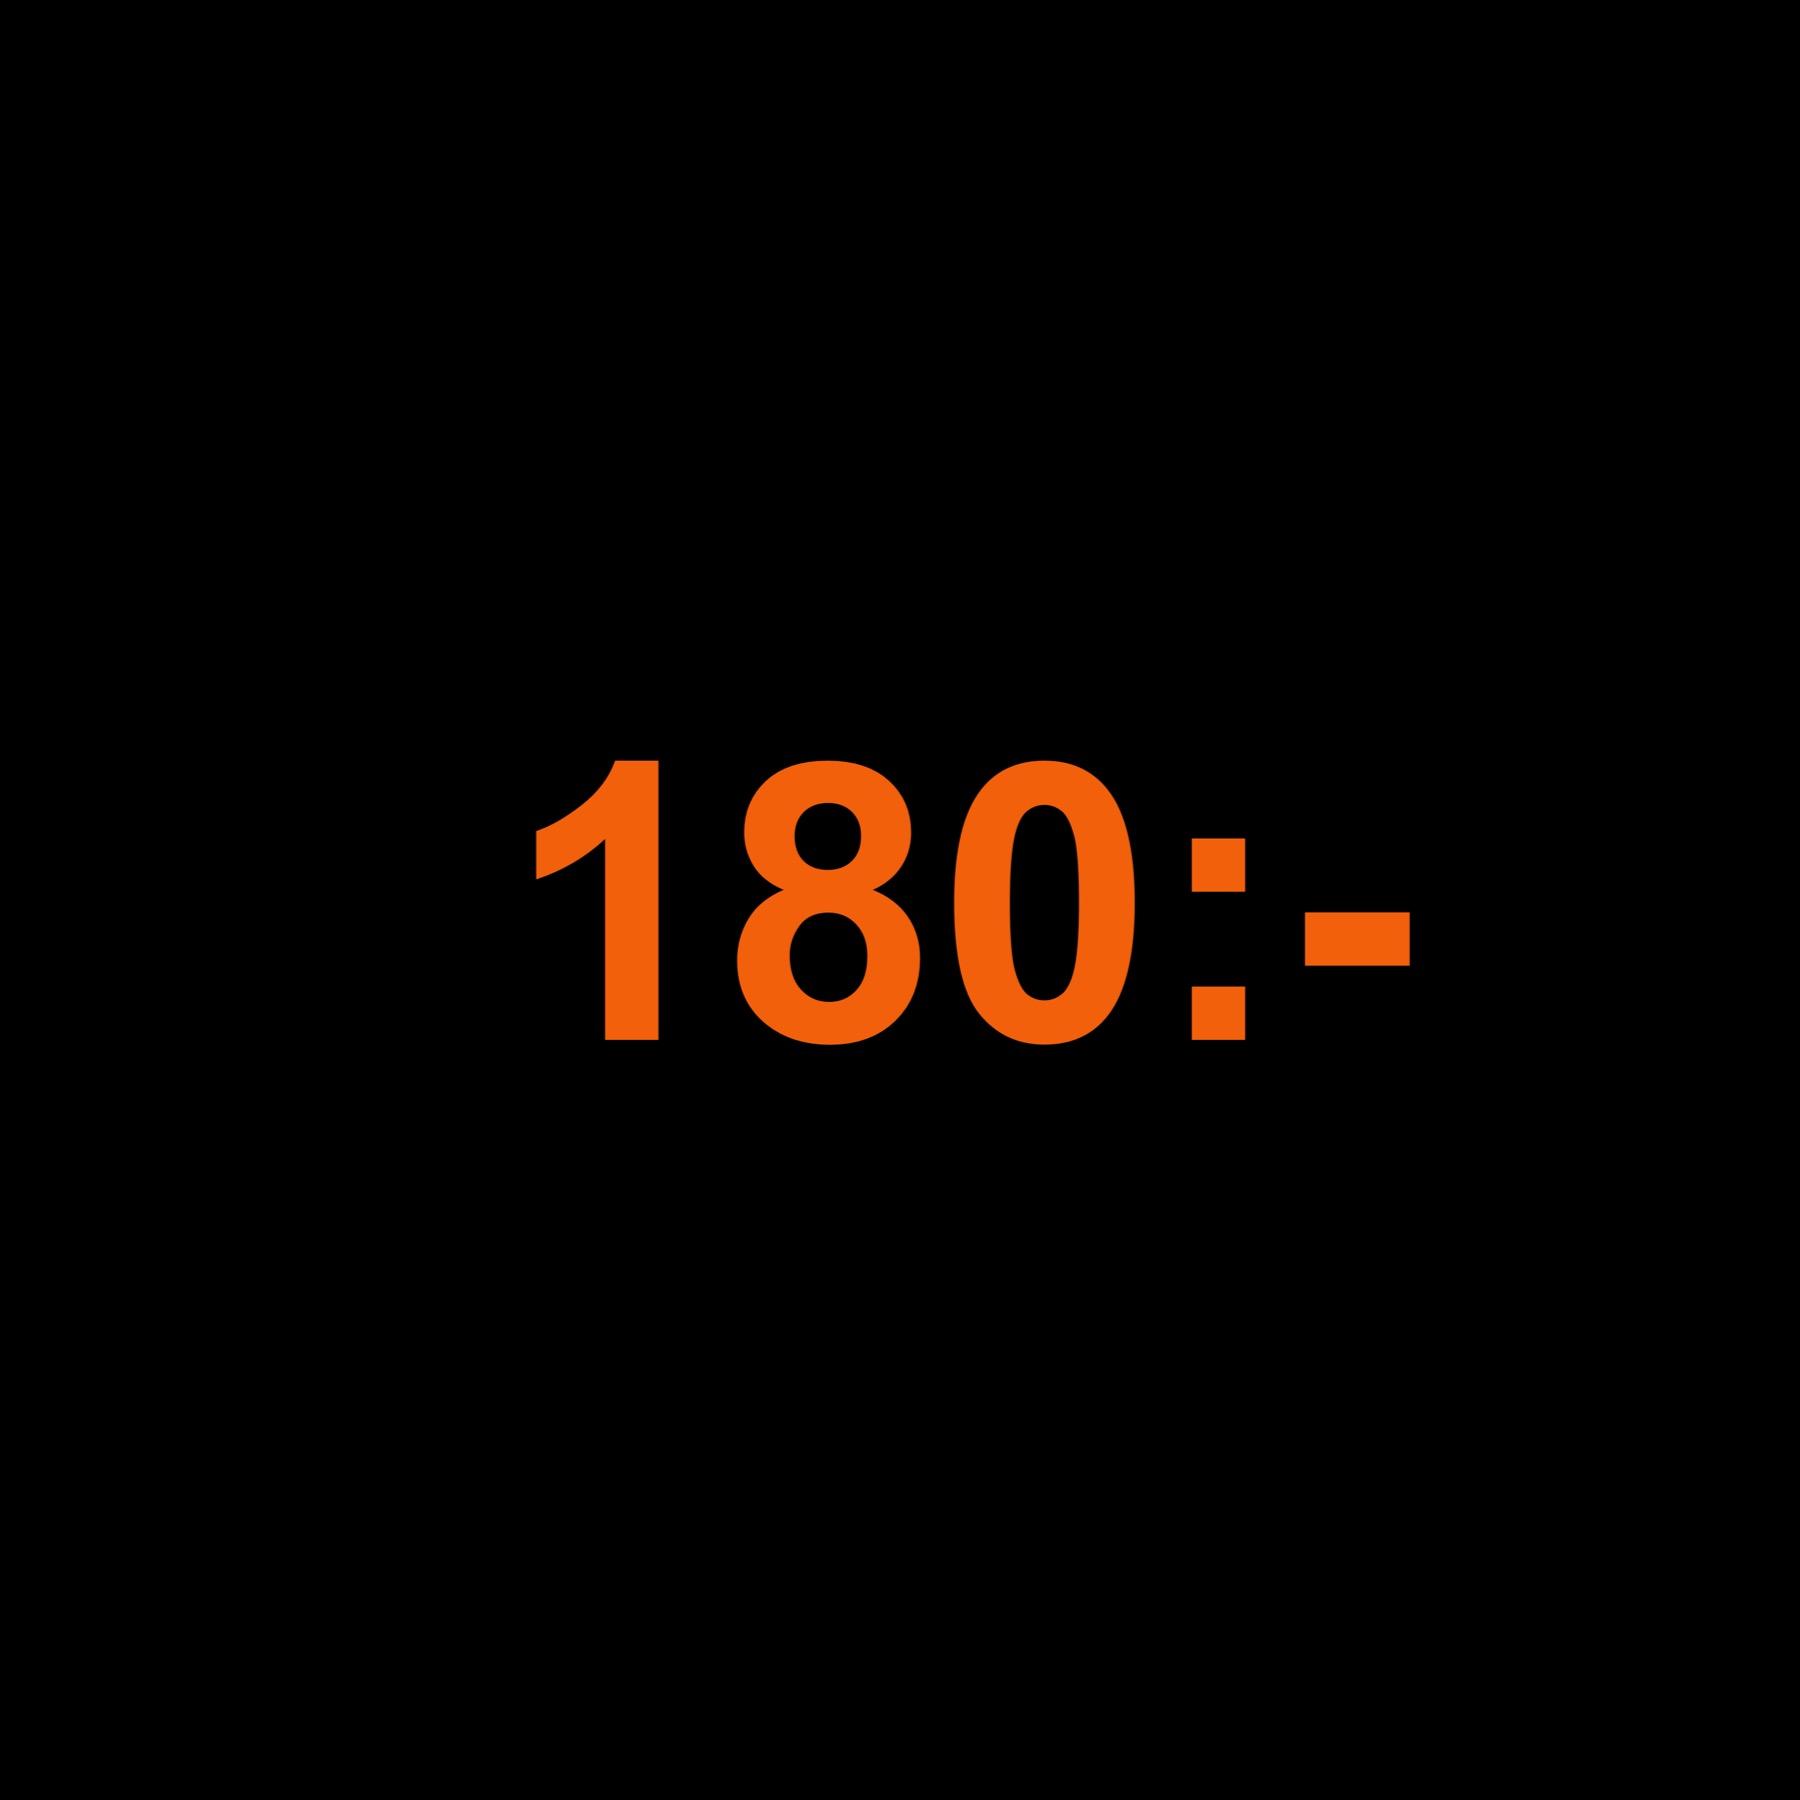 6104BE44-1A85-4C4A-BA7B-7ECF6D697347